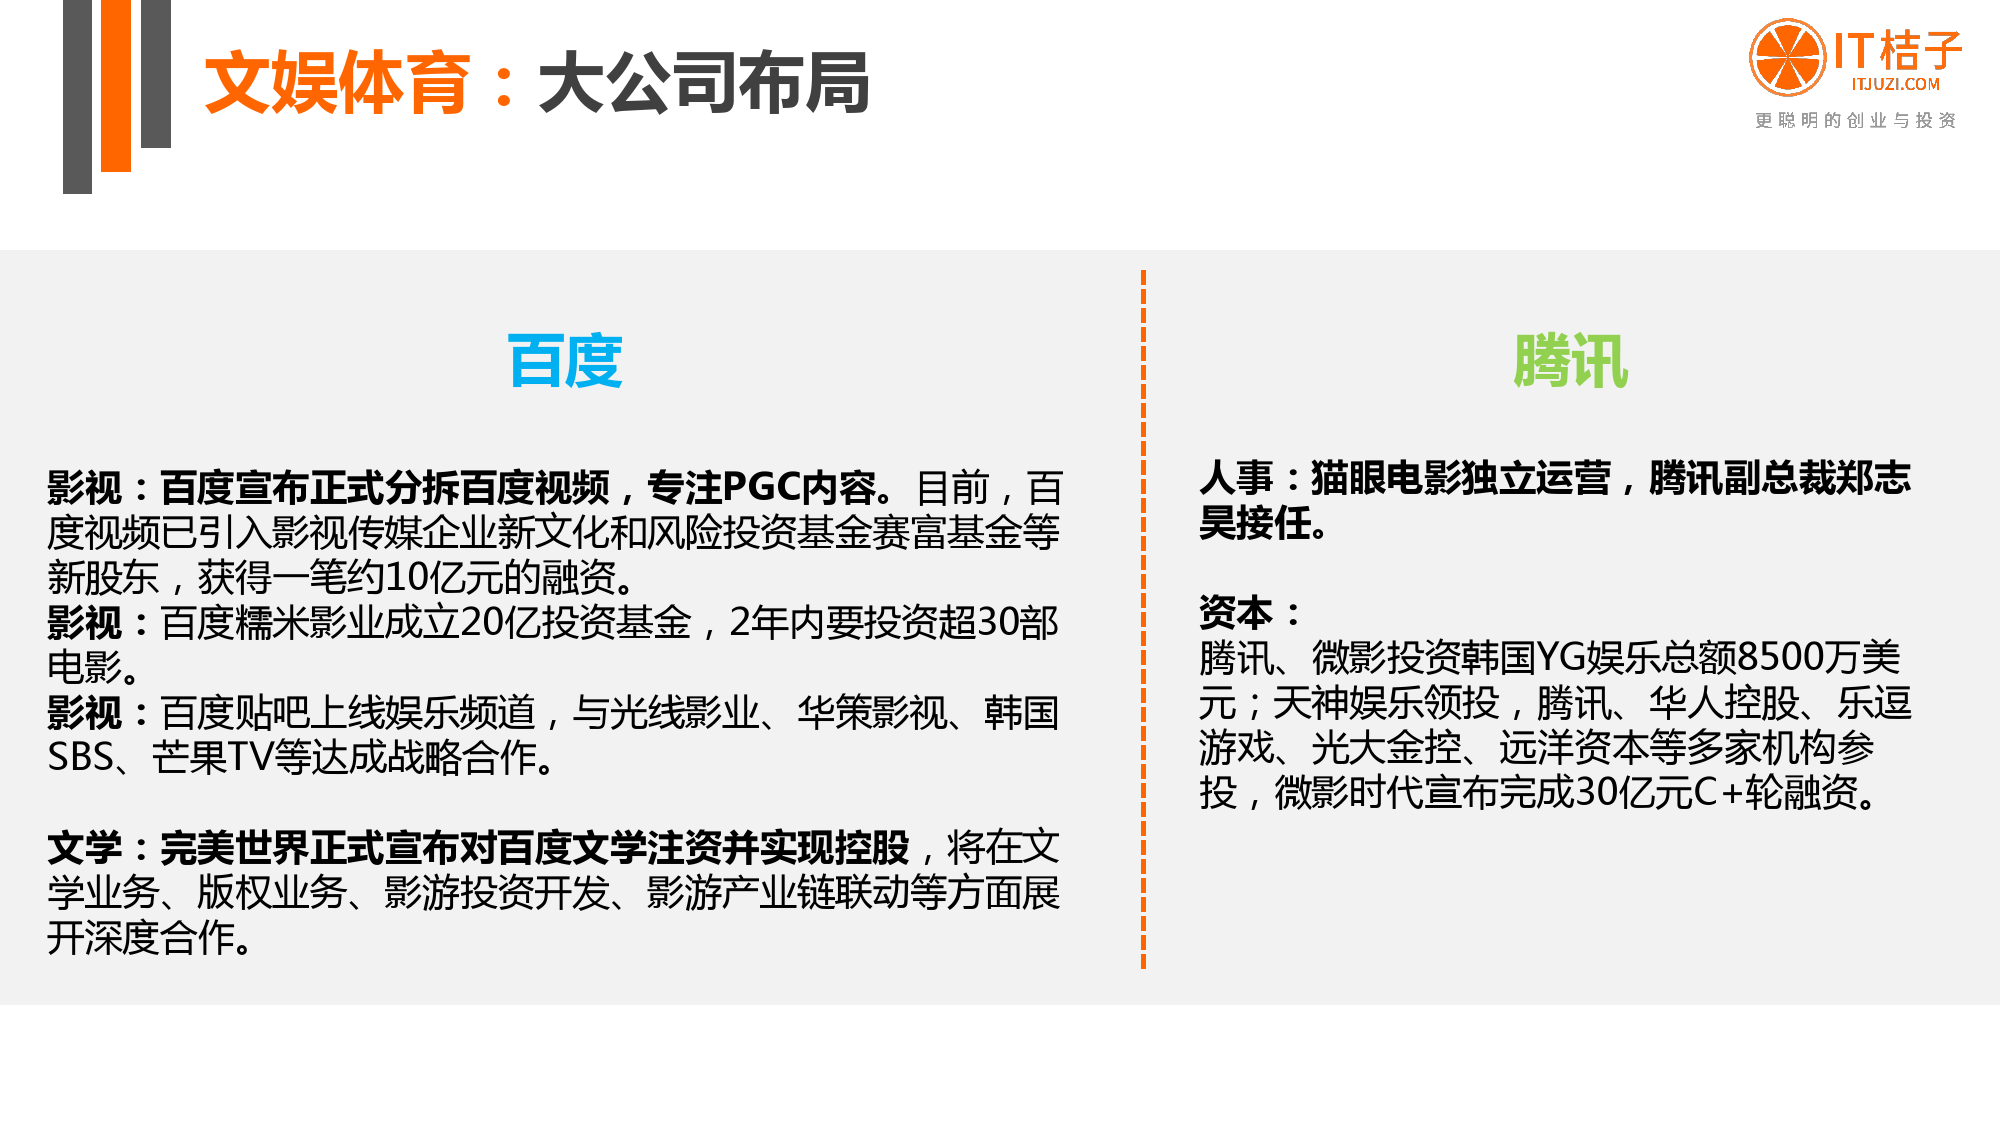 【IT桔子】2016年Q2中国互联网创业投资分析报告_000027